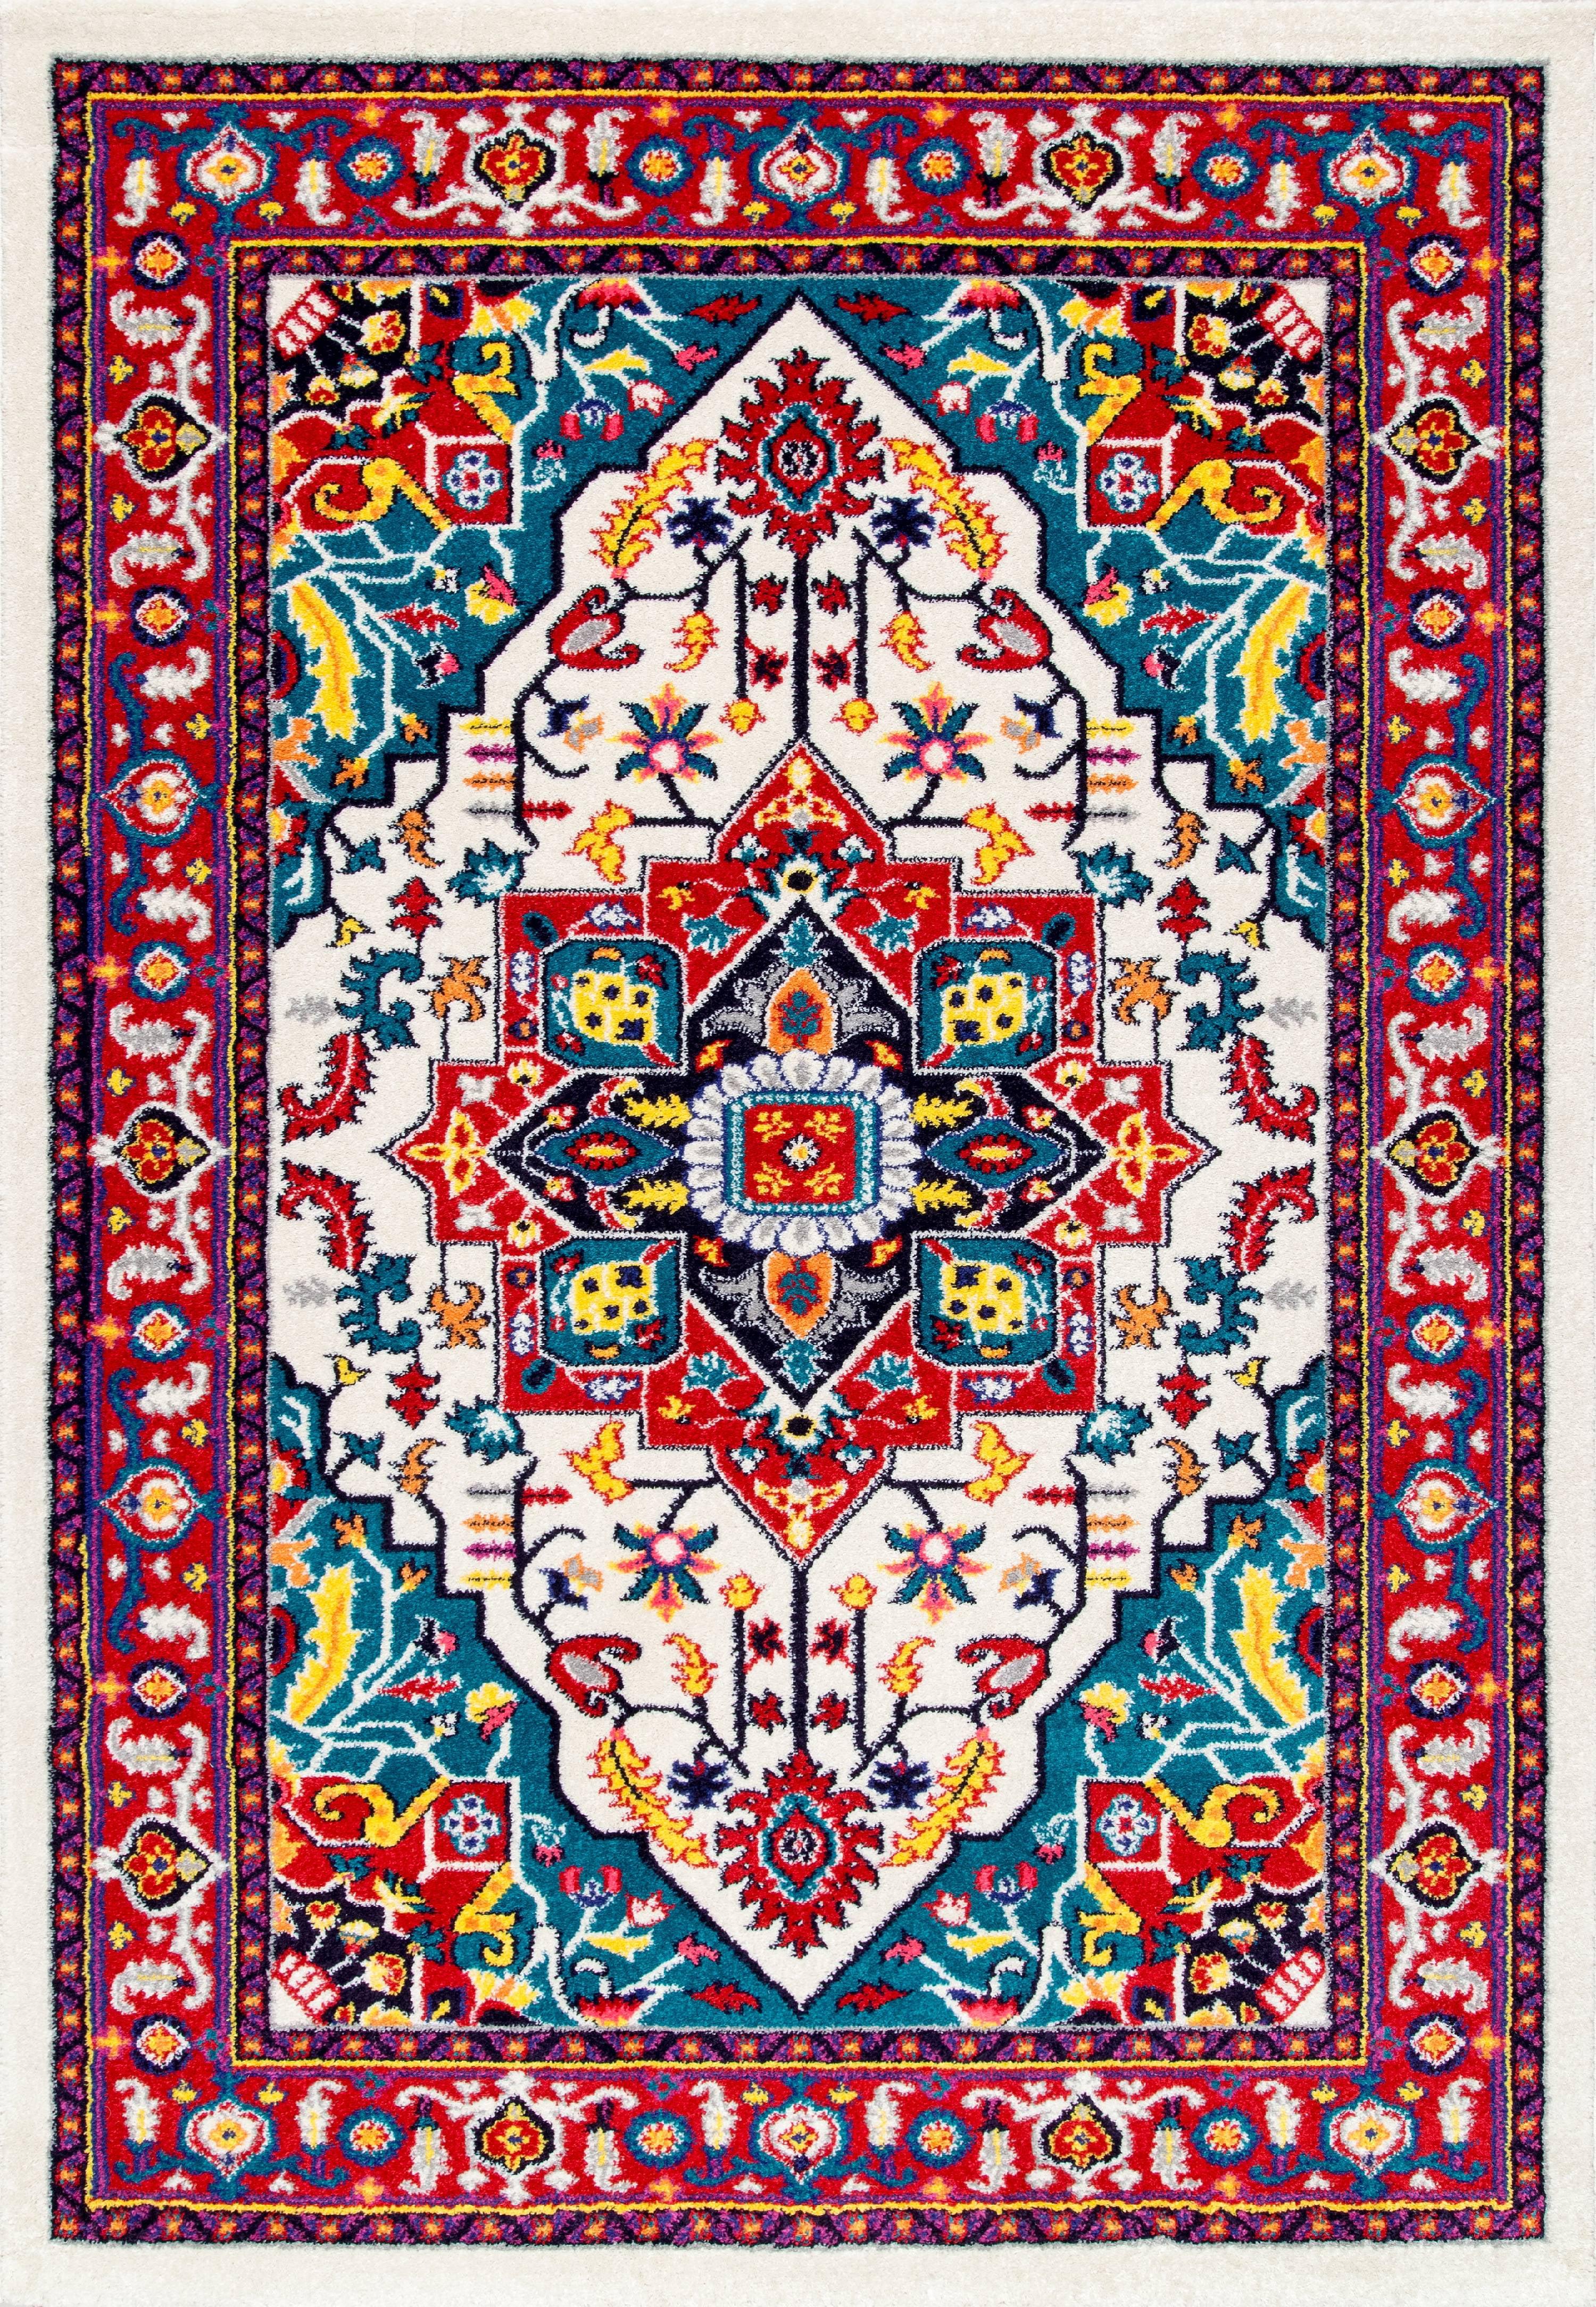 nuLOOM Persian Floral Elenor Area Rug or Runner by nuLOOM